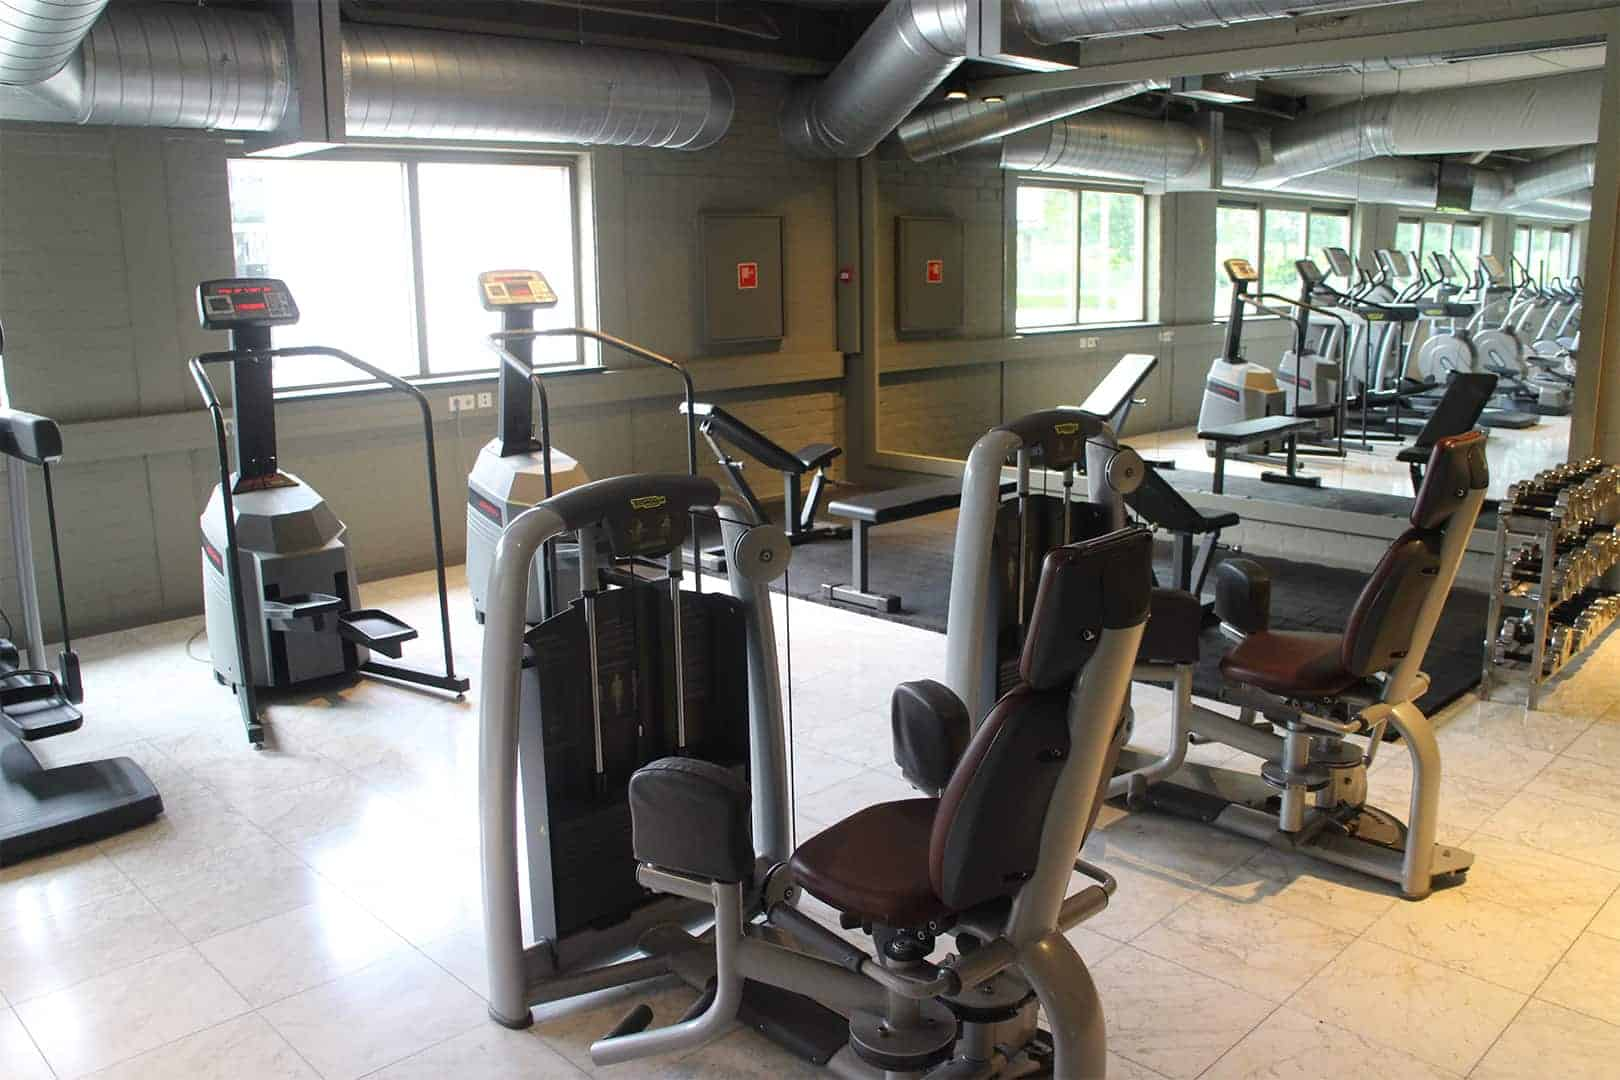 Fitness Studiosport Tubbergen 50